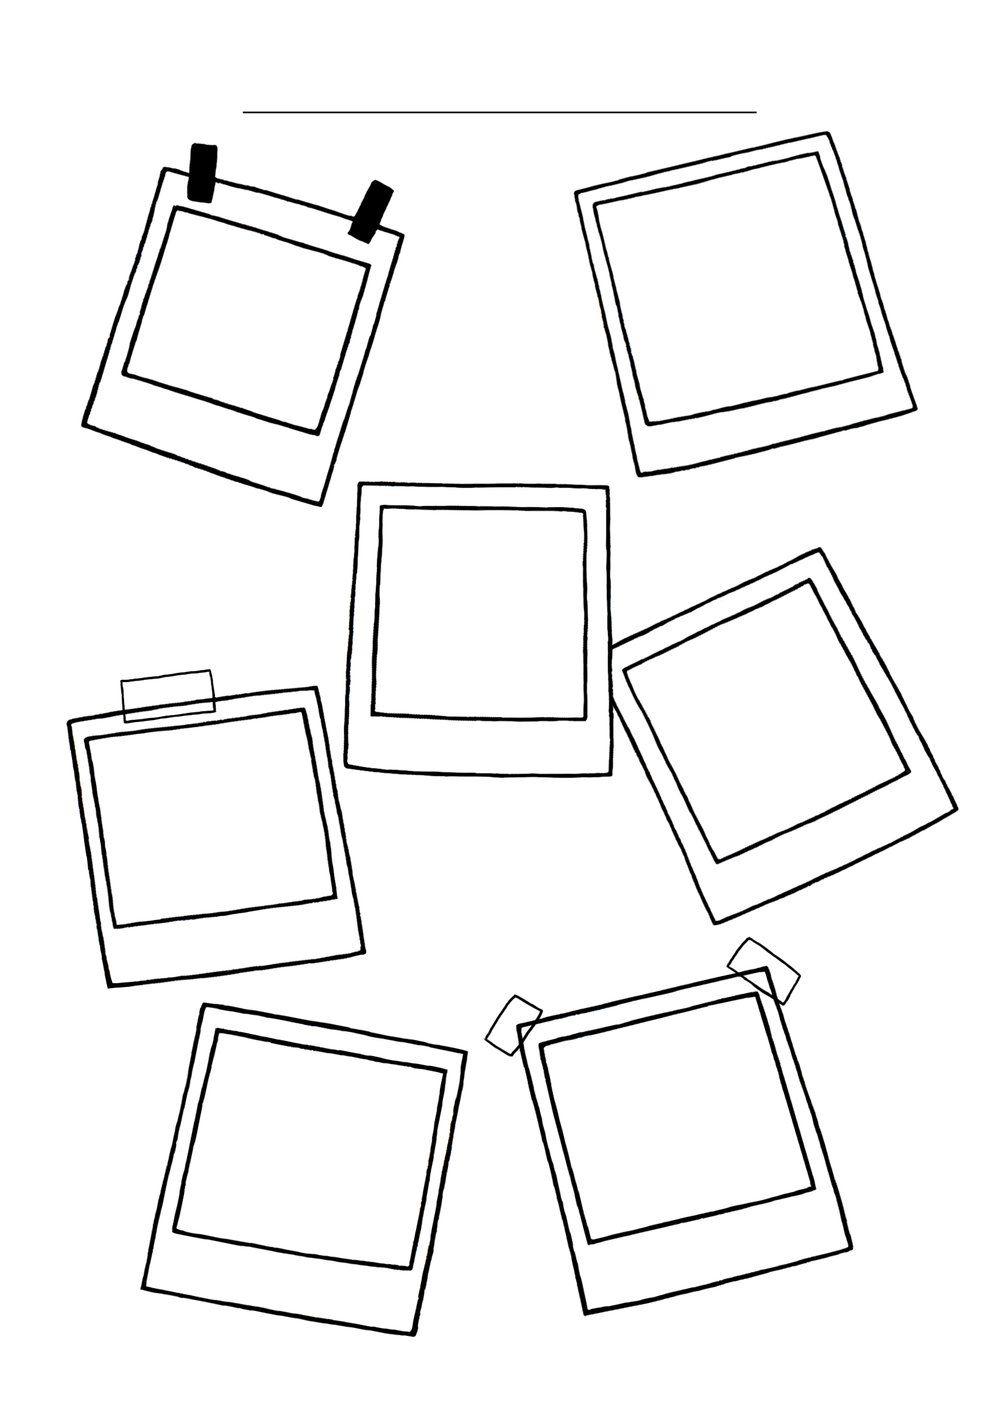 Polaroid Frame Doodles: Bullet Journal Ideas for Self-Care